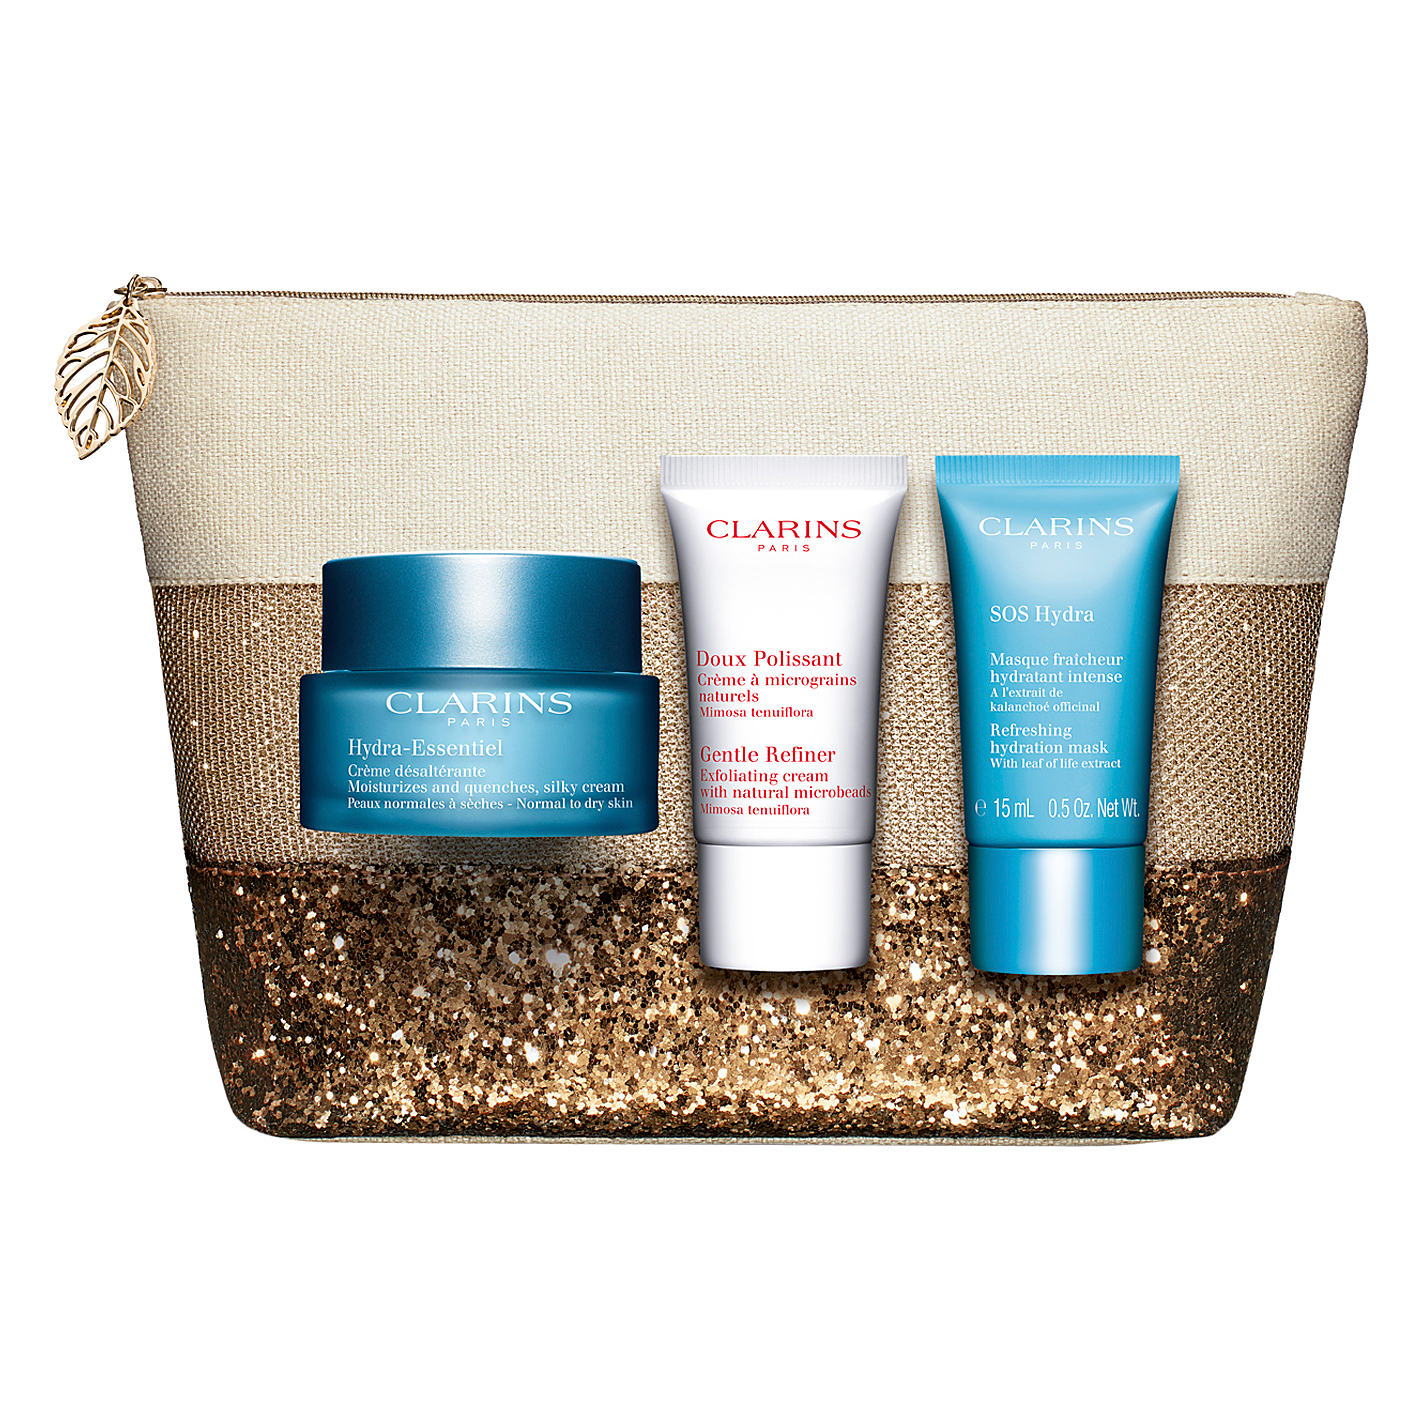 Clarins Hydra-Essentiel Skincare Set的圖片搜尋結果